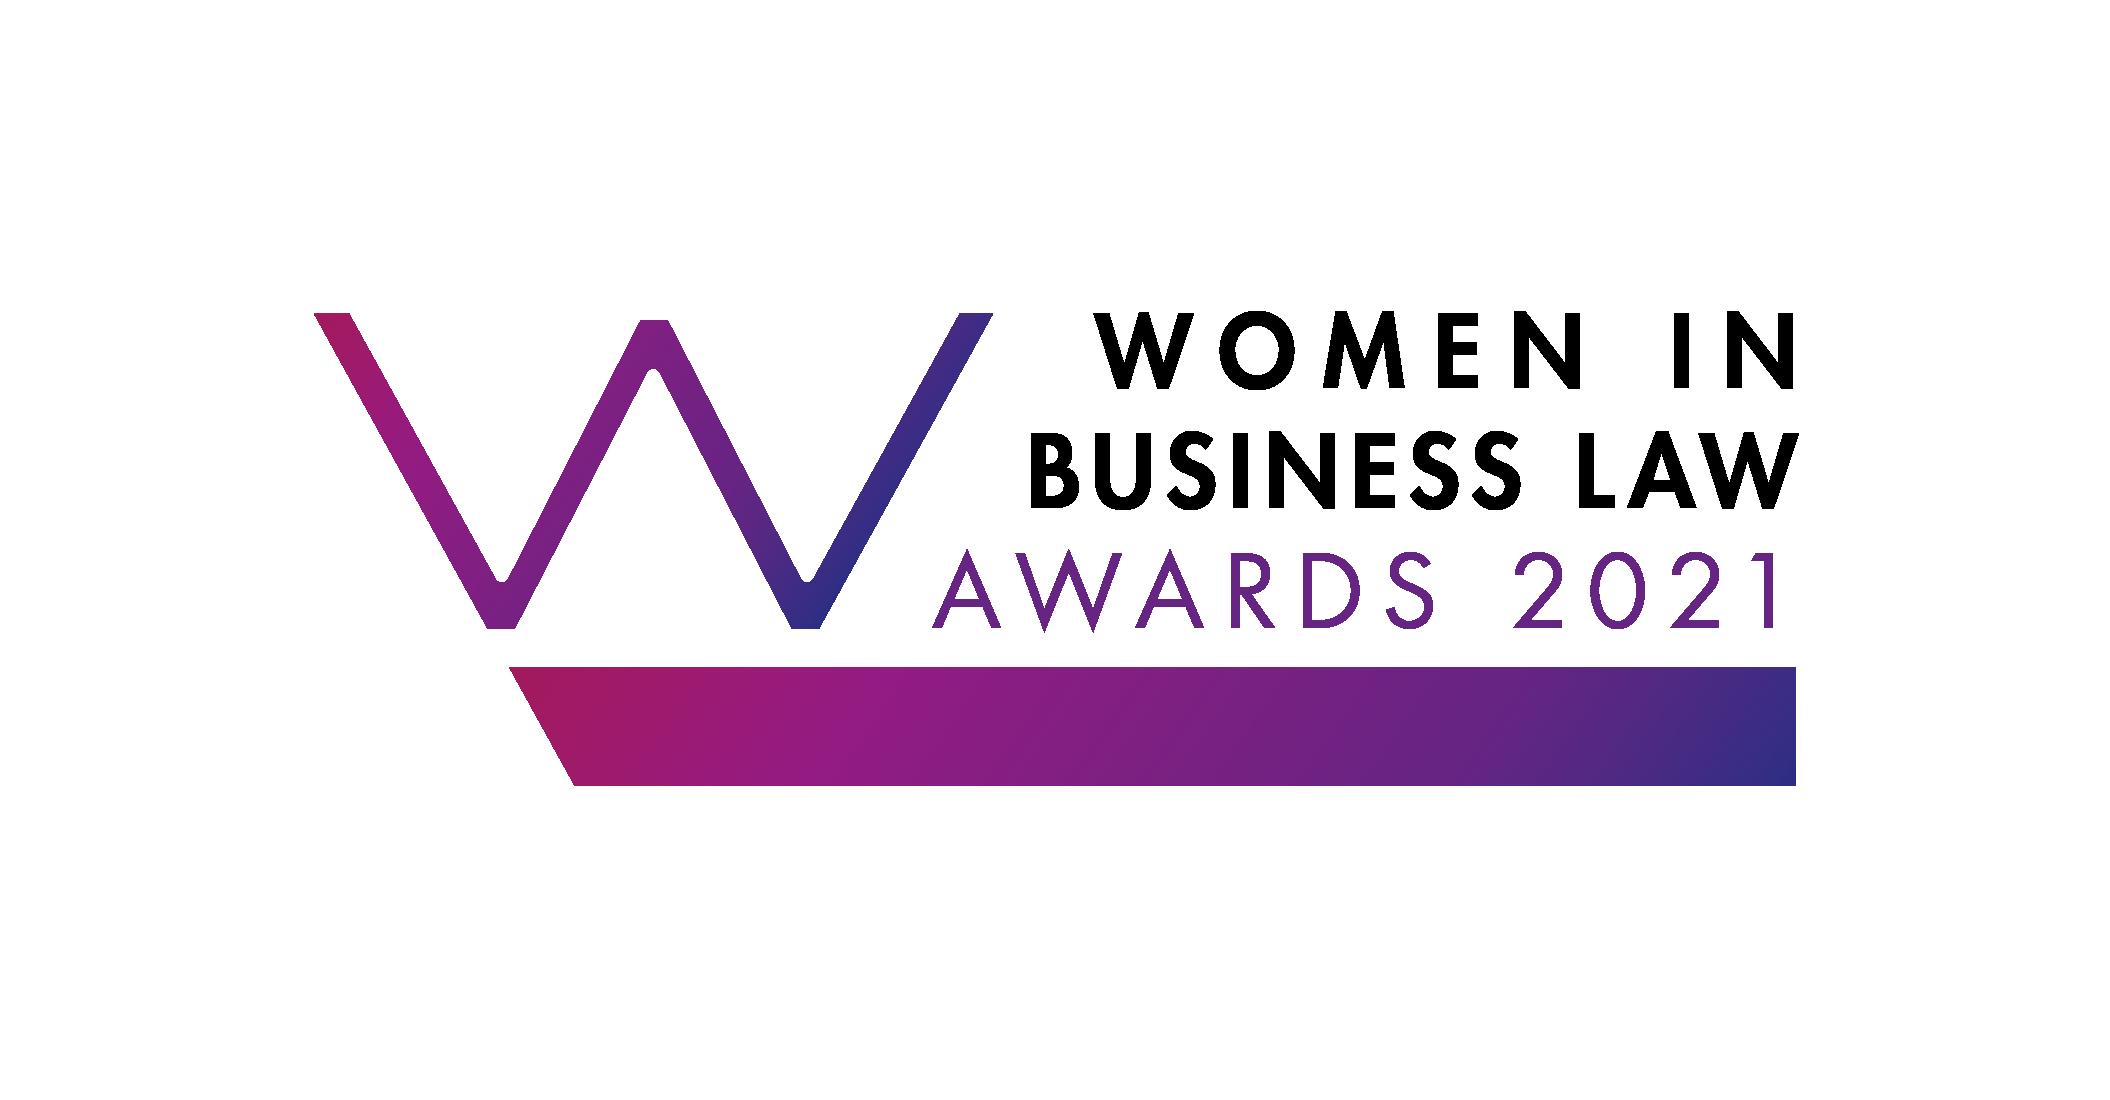 Women in Business Law Awards Europe 2021 – Israel Winners Announced